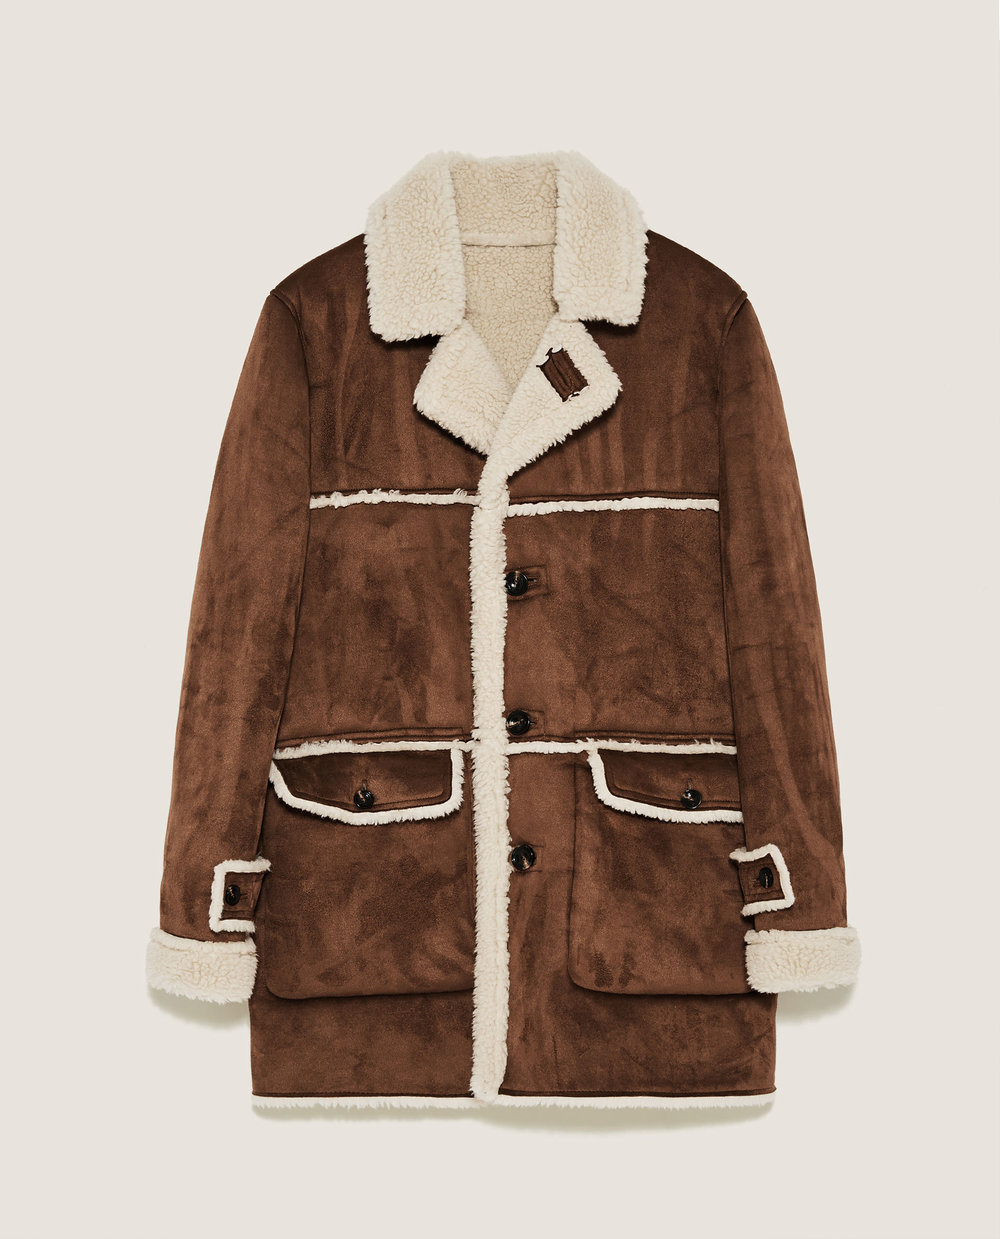 The Shearling Men S Style Edit Shearling Coats For Men Men S